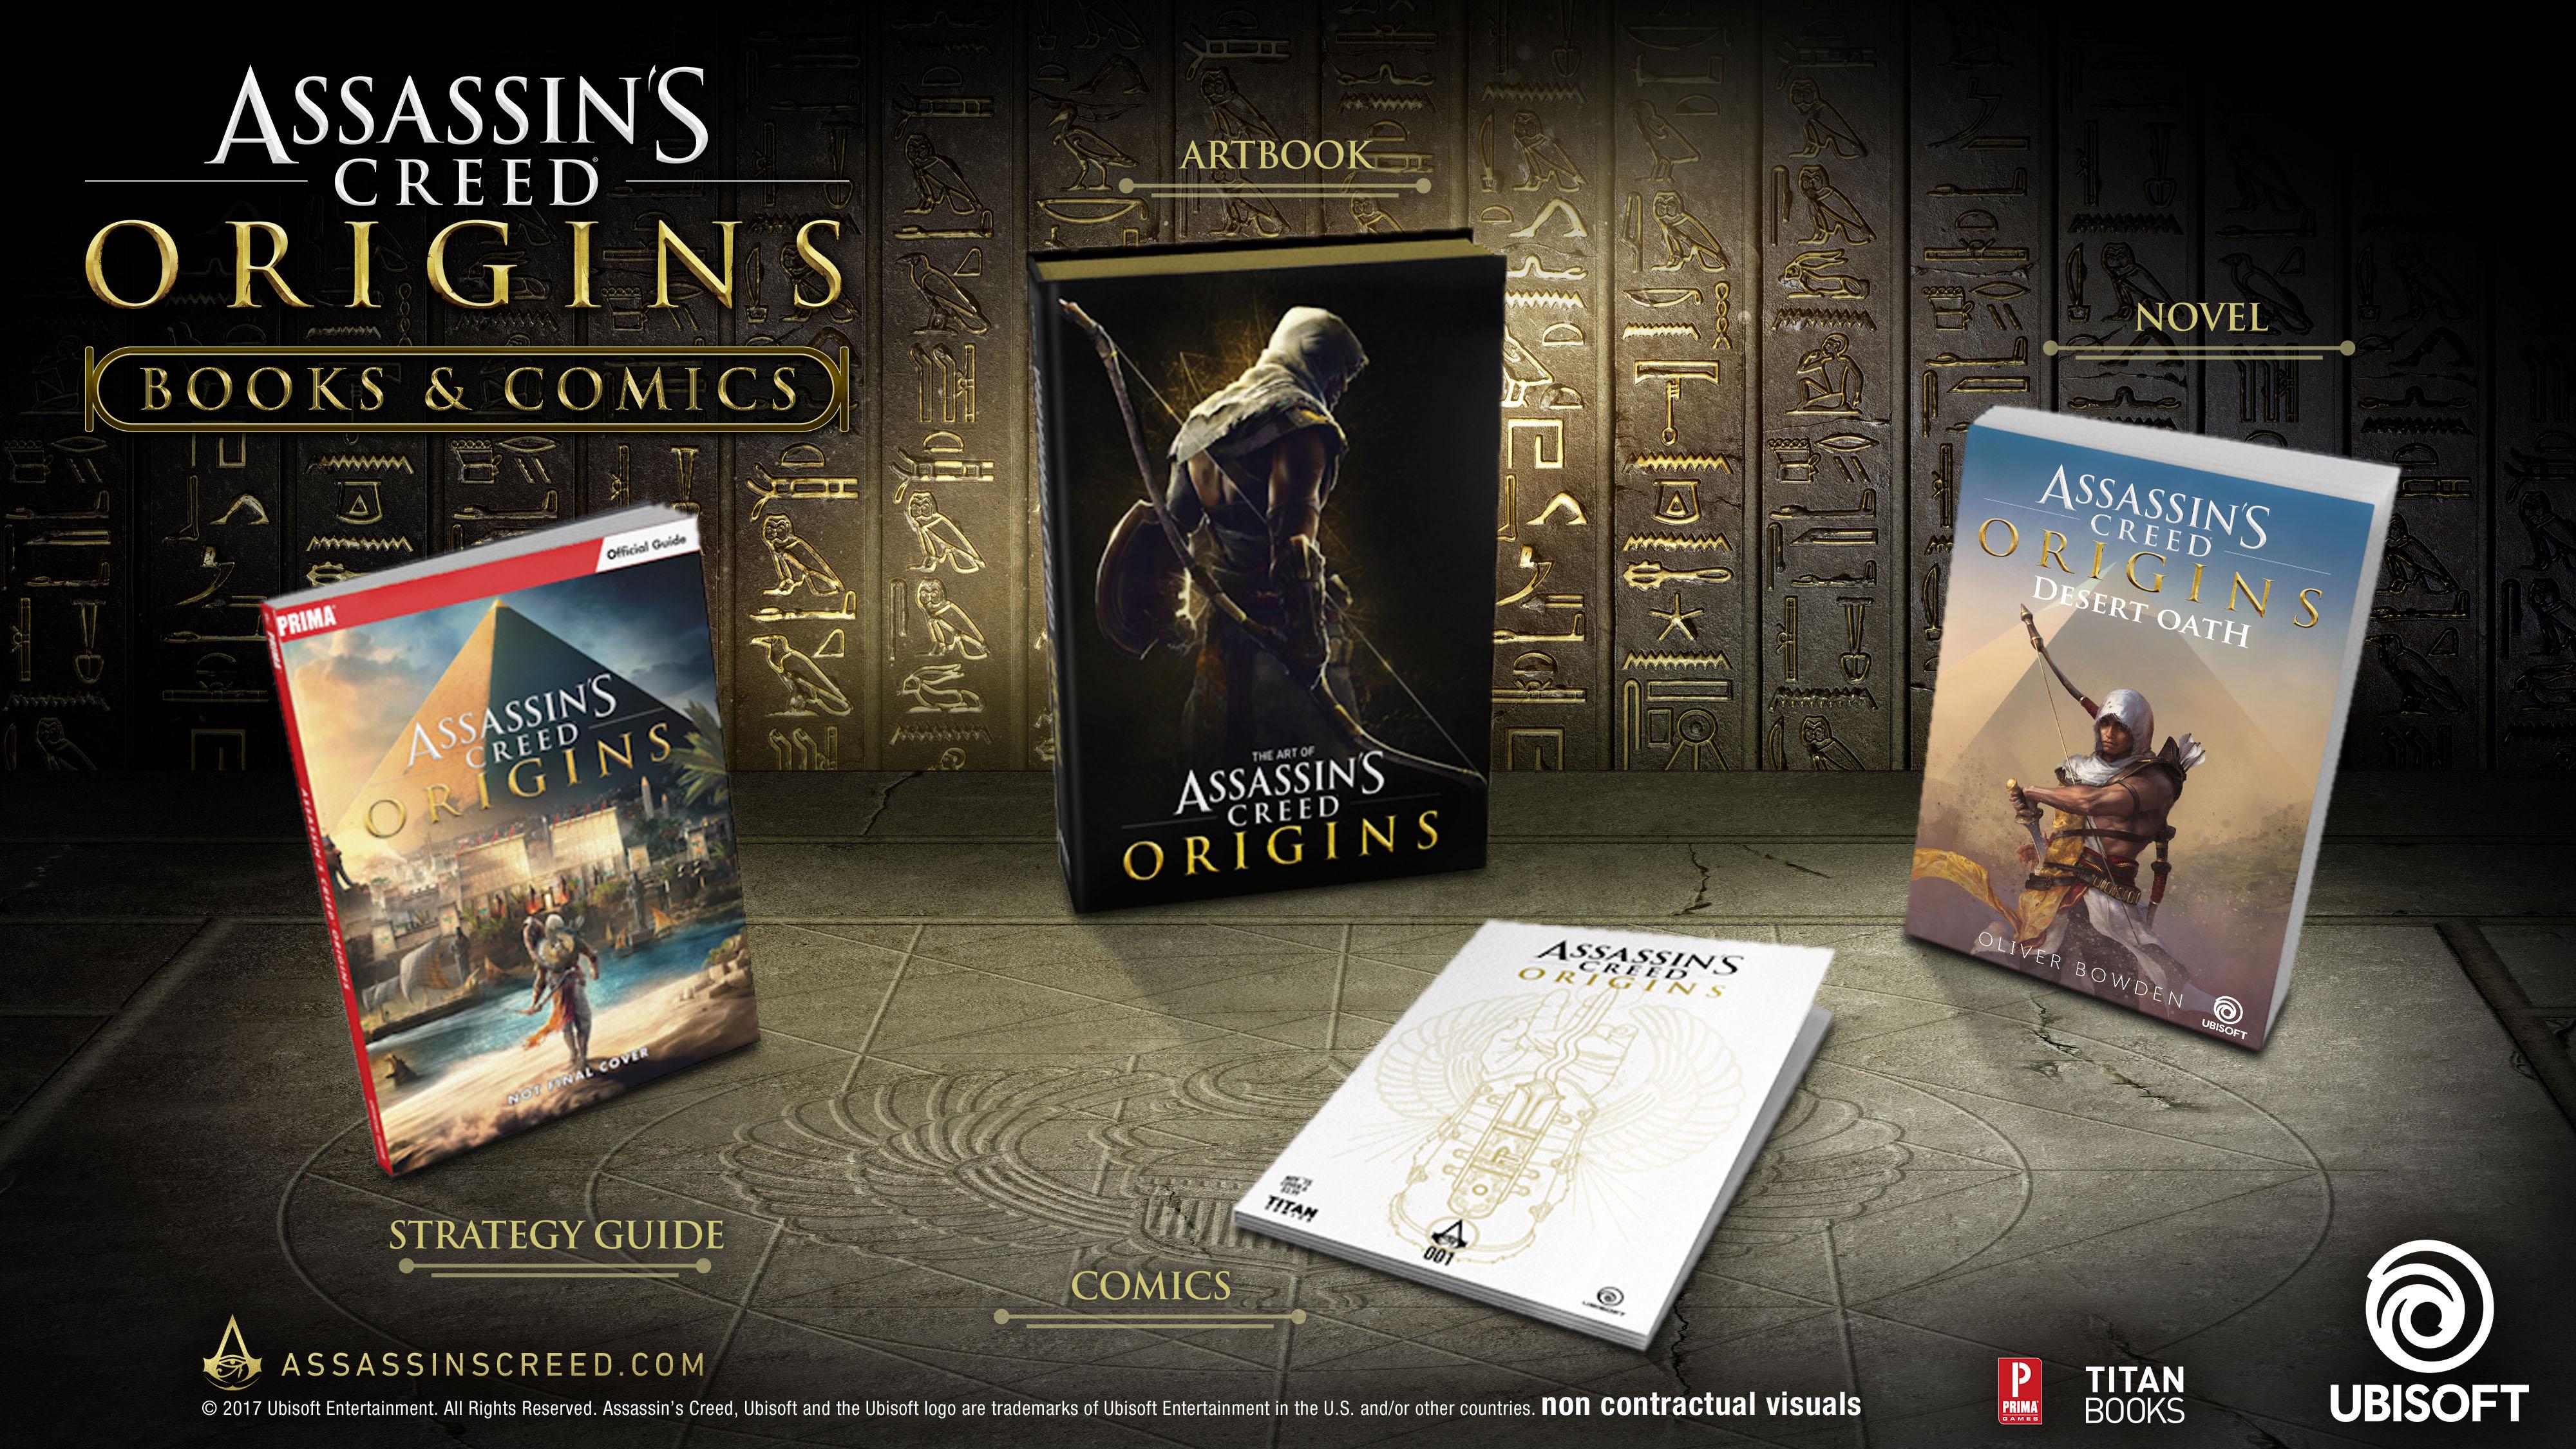 assassin s creed origins novel comics and more planned for fall rh news ubisoft com Assassin's Creed Wallpaper assassin's creed 2 guide book ebay